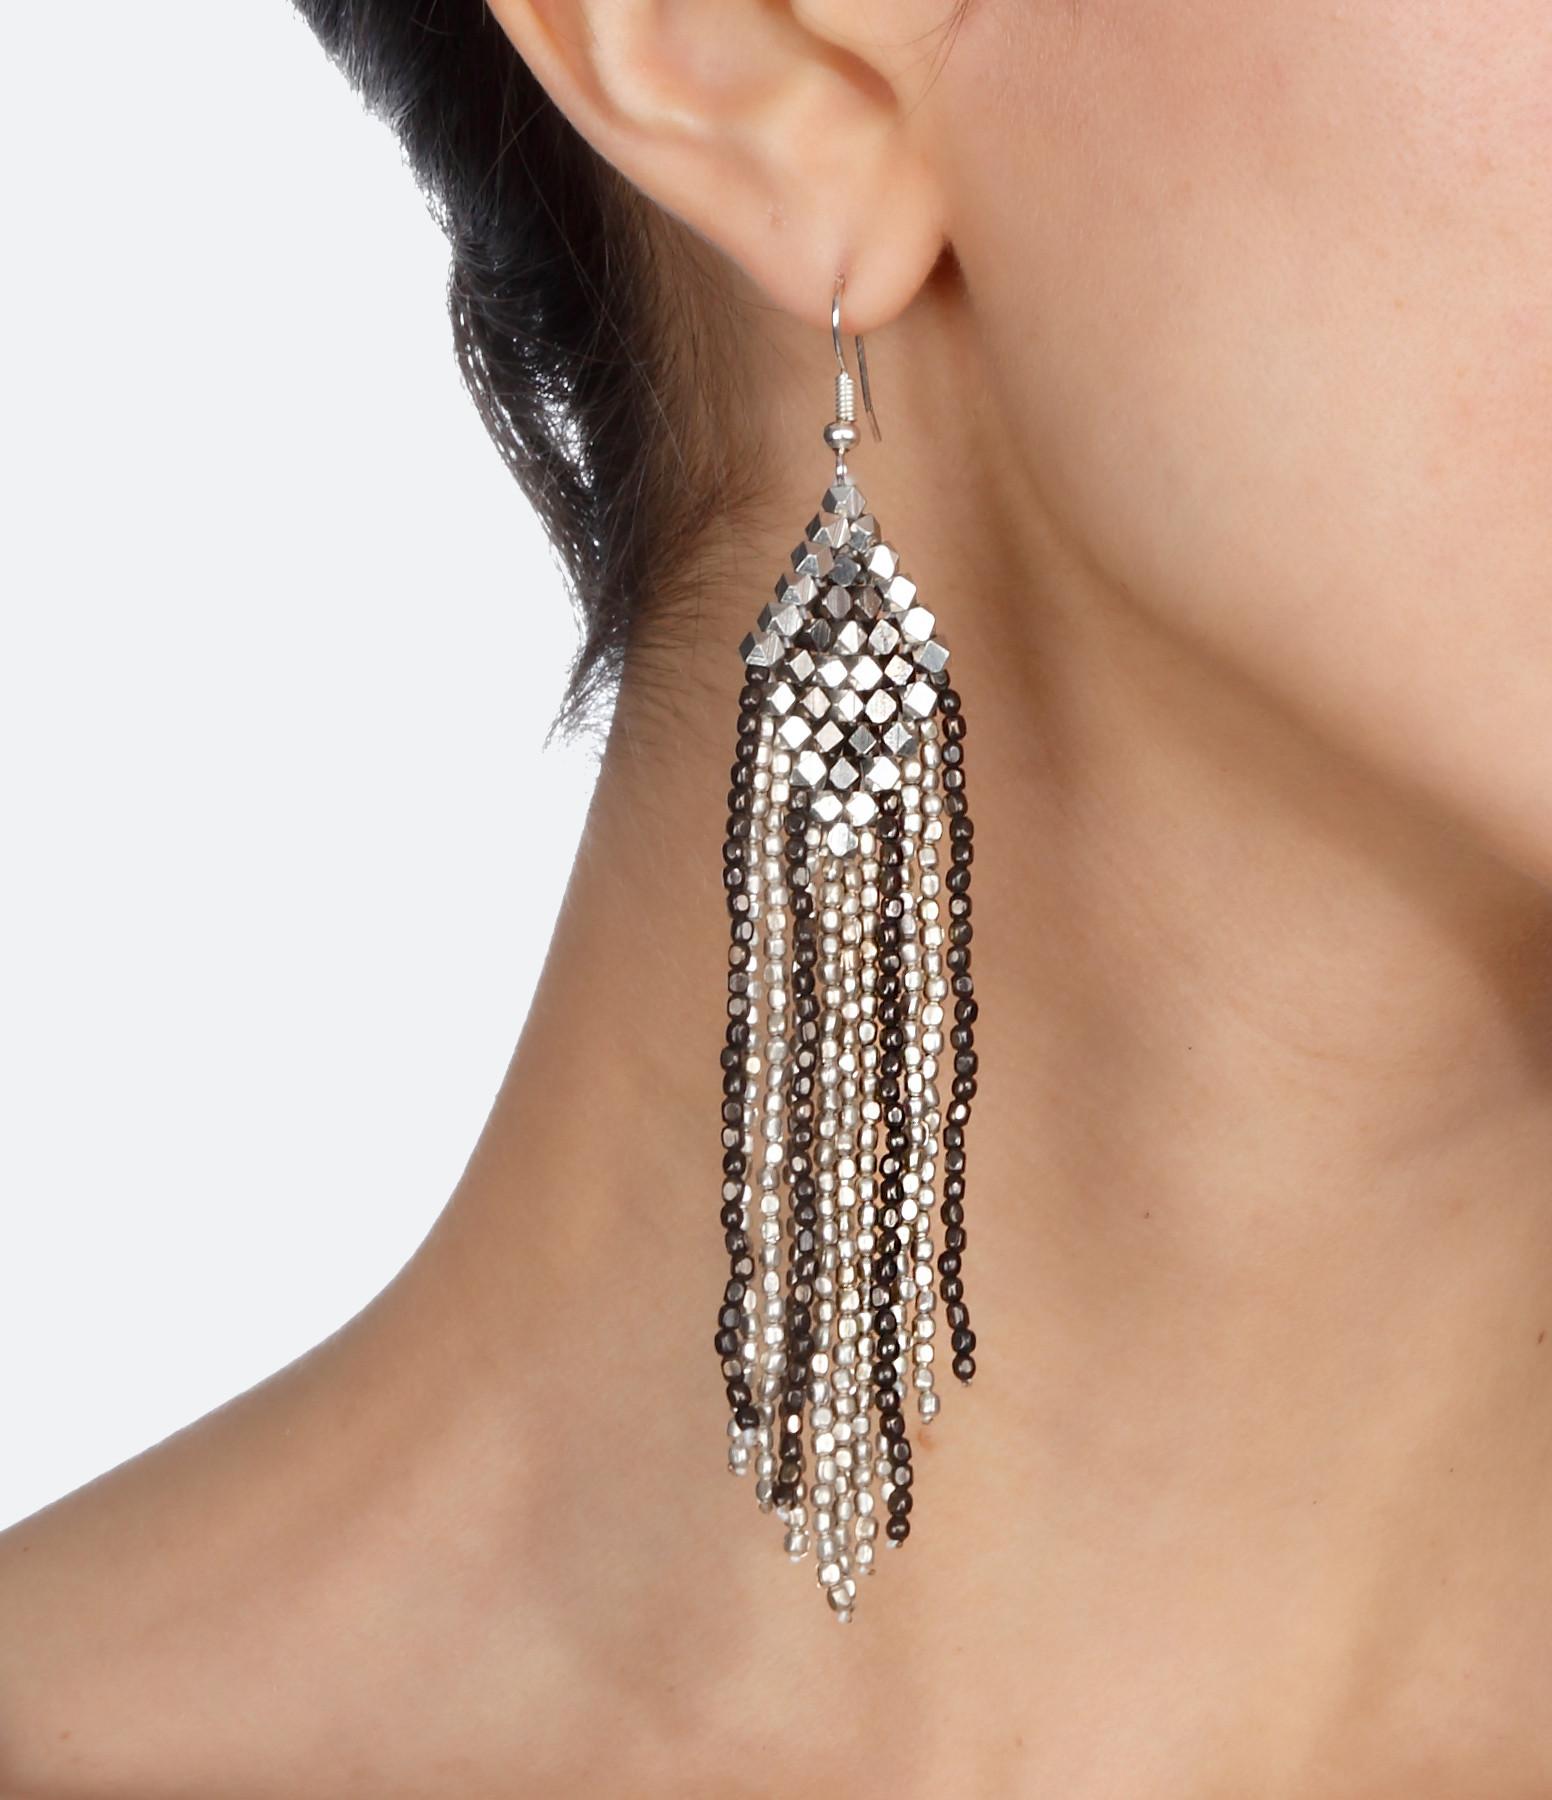 Boucles d'oreilles Kéa - IZI MI